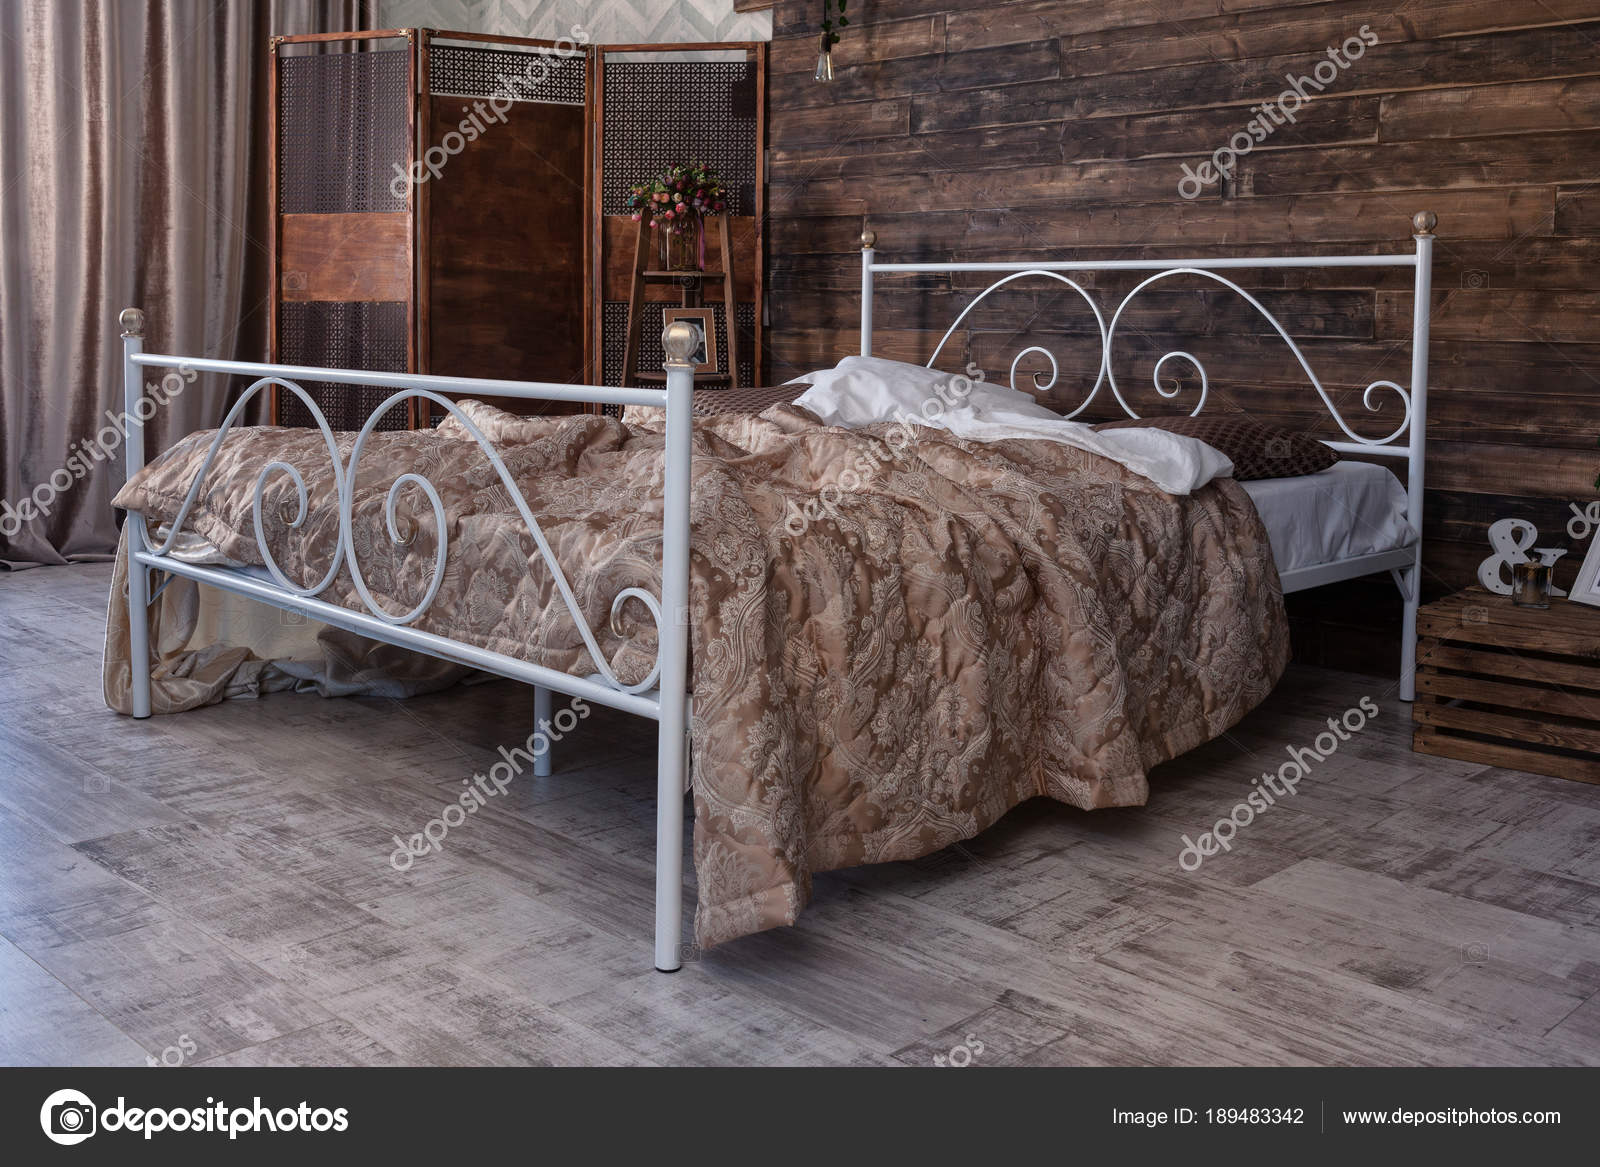 Schmiedeeisen Bett Stockfoto C Alfoto Bk Ru 189483342